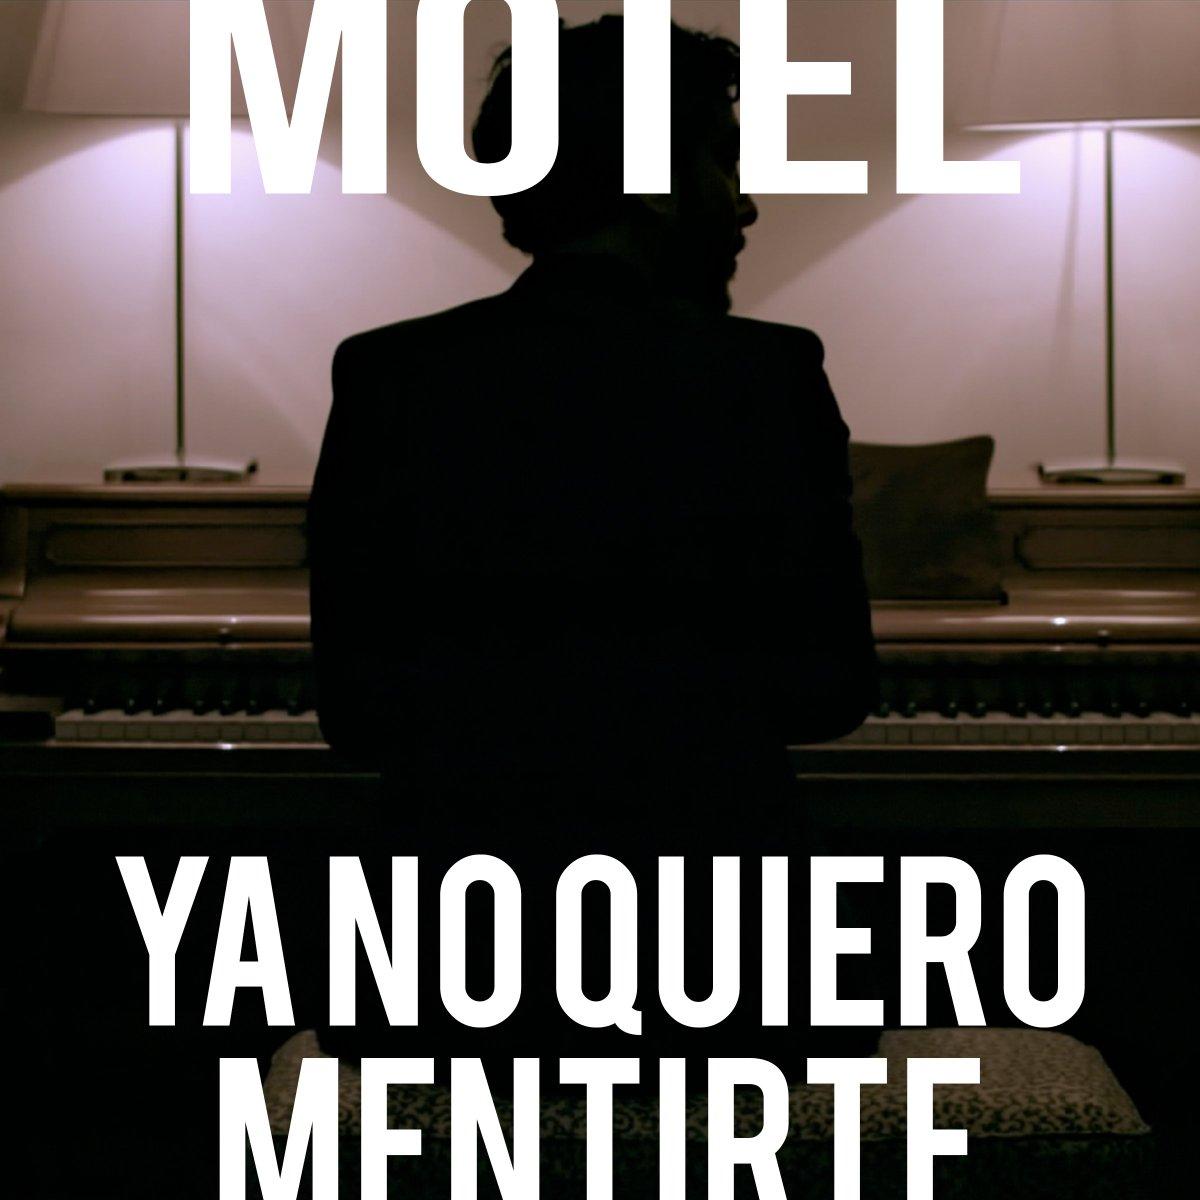 Notice: Undefined variable: ¡¡Ya pueden disfrutar de #YaNoQuieroMentirte en todas las plataformas digitales!! #Macho 🎶 https://t.co/kaoEWm9Luu https://t.co/AFqDe0erkz in /hsphere/local/home/motelmxf/motelmx.com/wp-content/themes/motel/external/motel-utilities.php on line 157